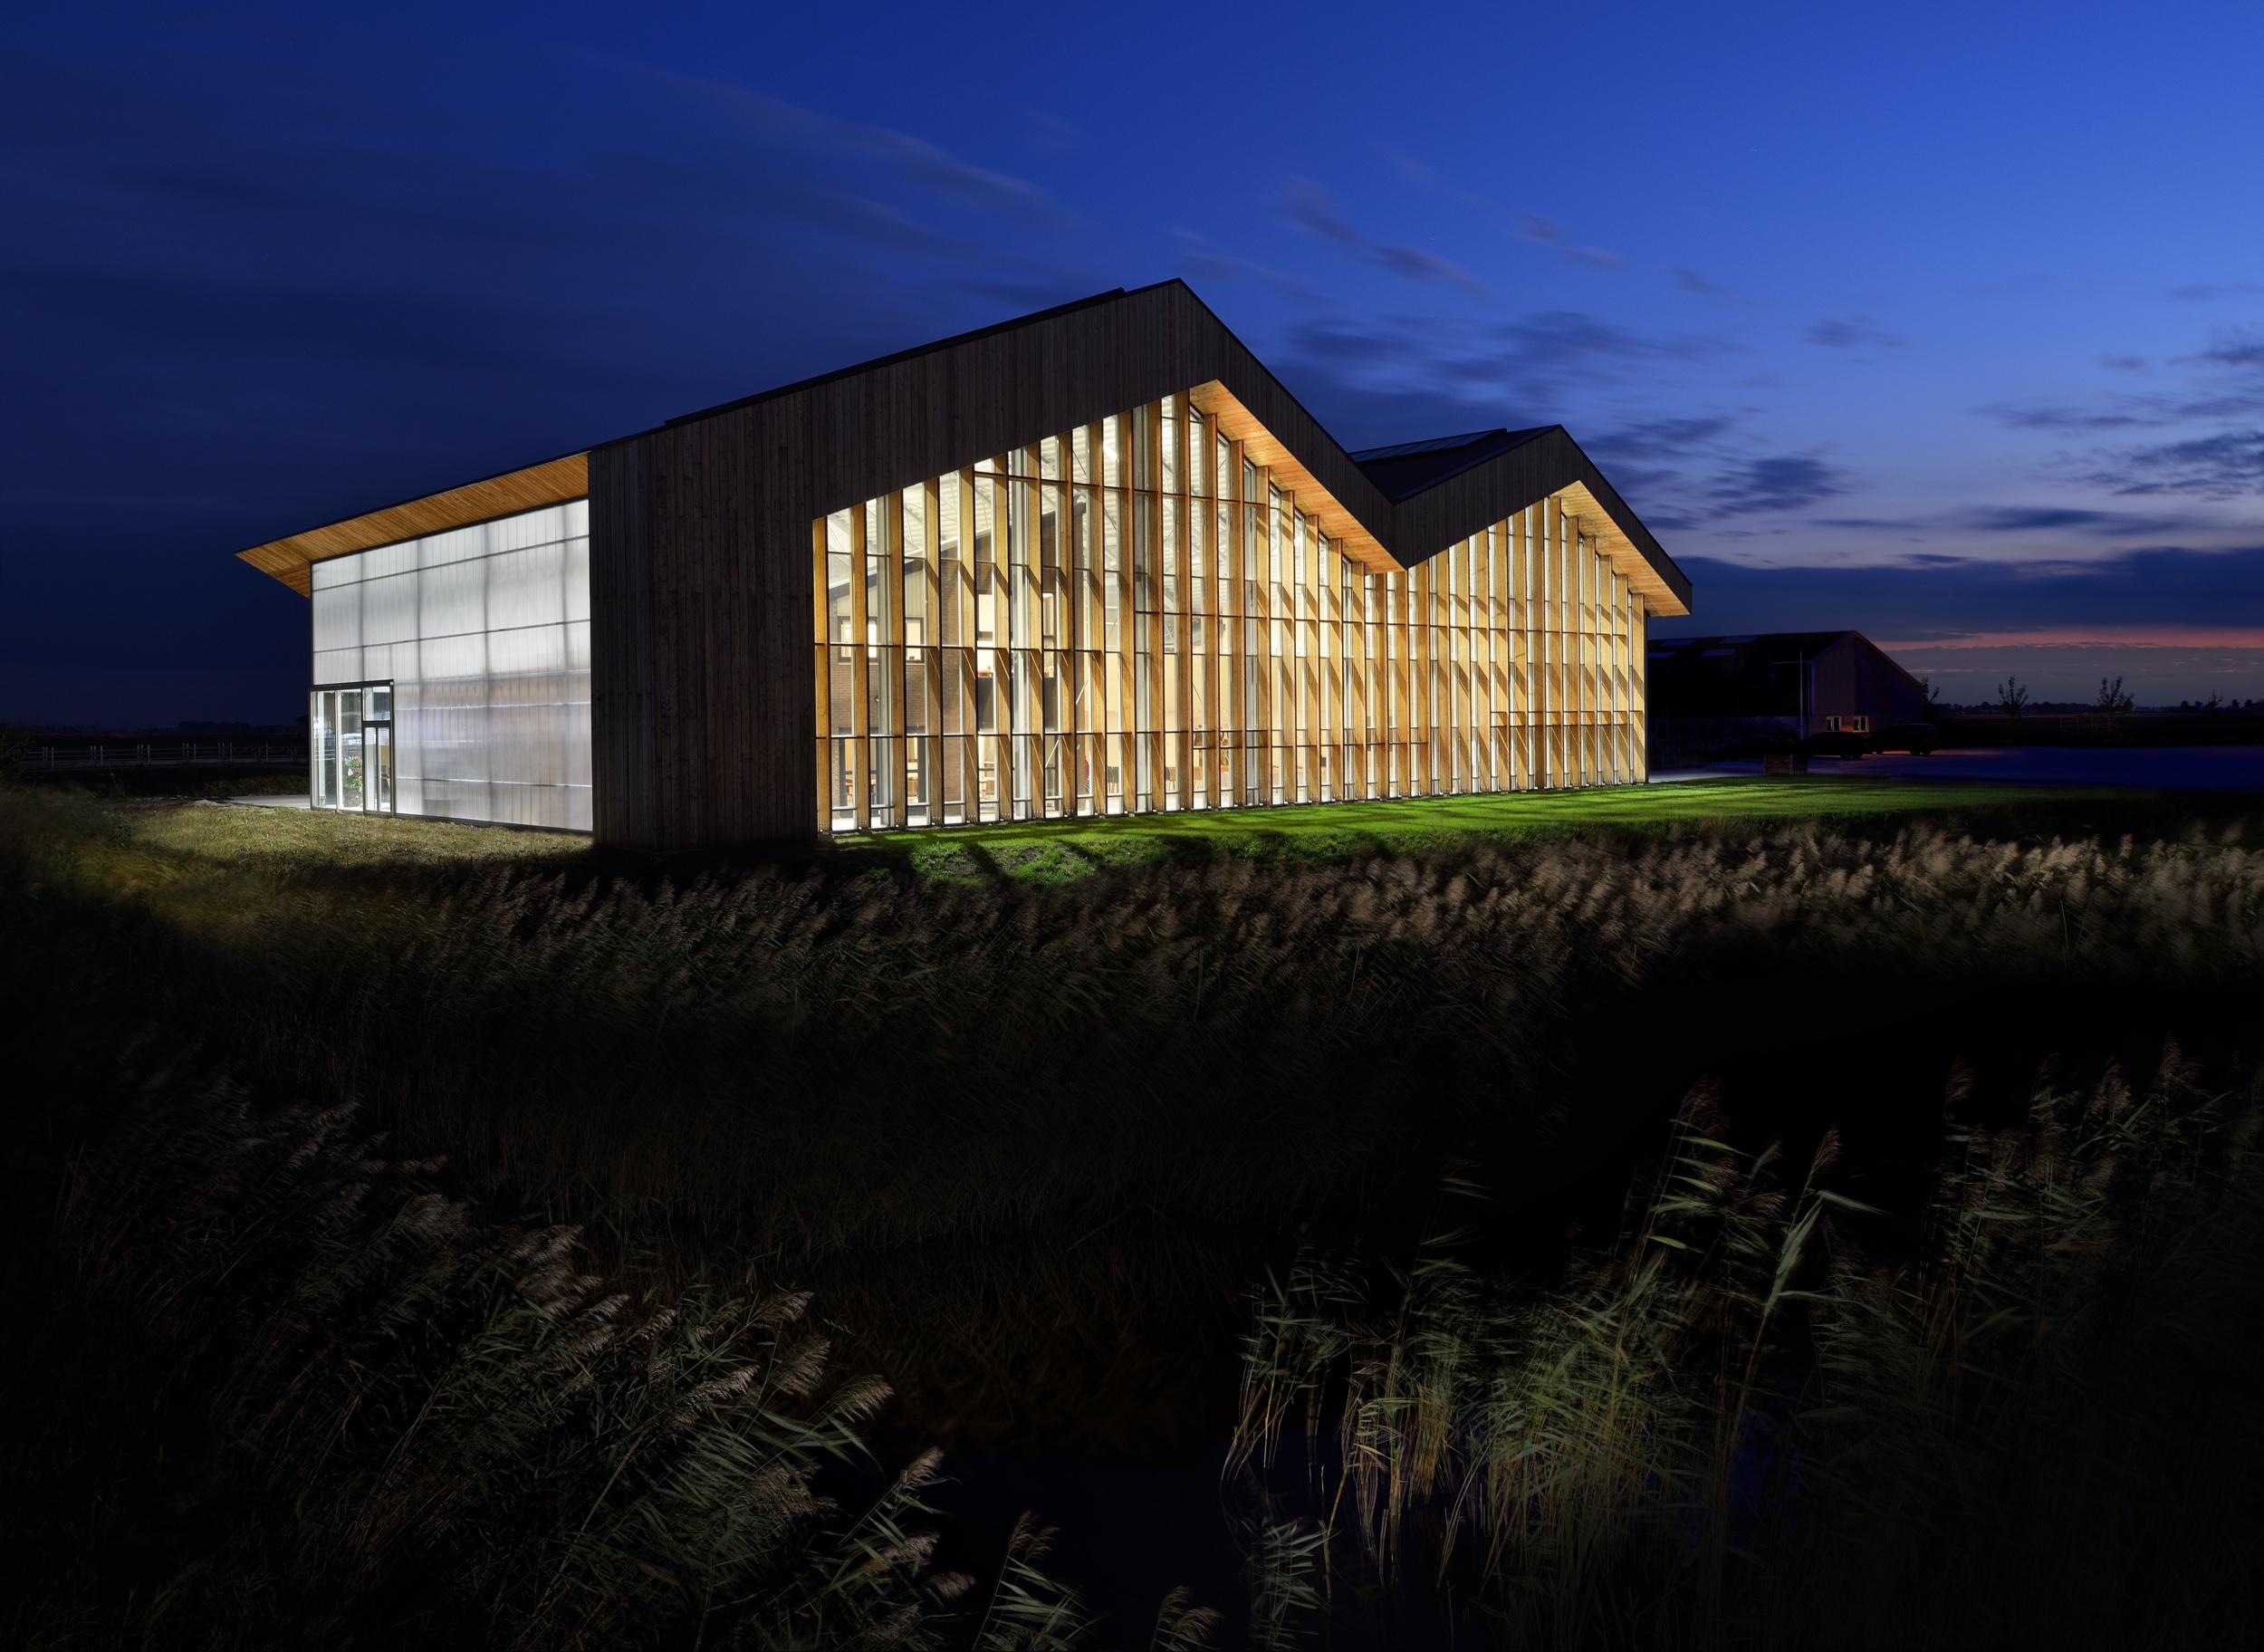 Dairy Campus, Leeuwarden - Arcadis, door Chiel de Nooyer architectuurfotograaf